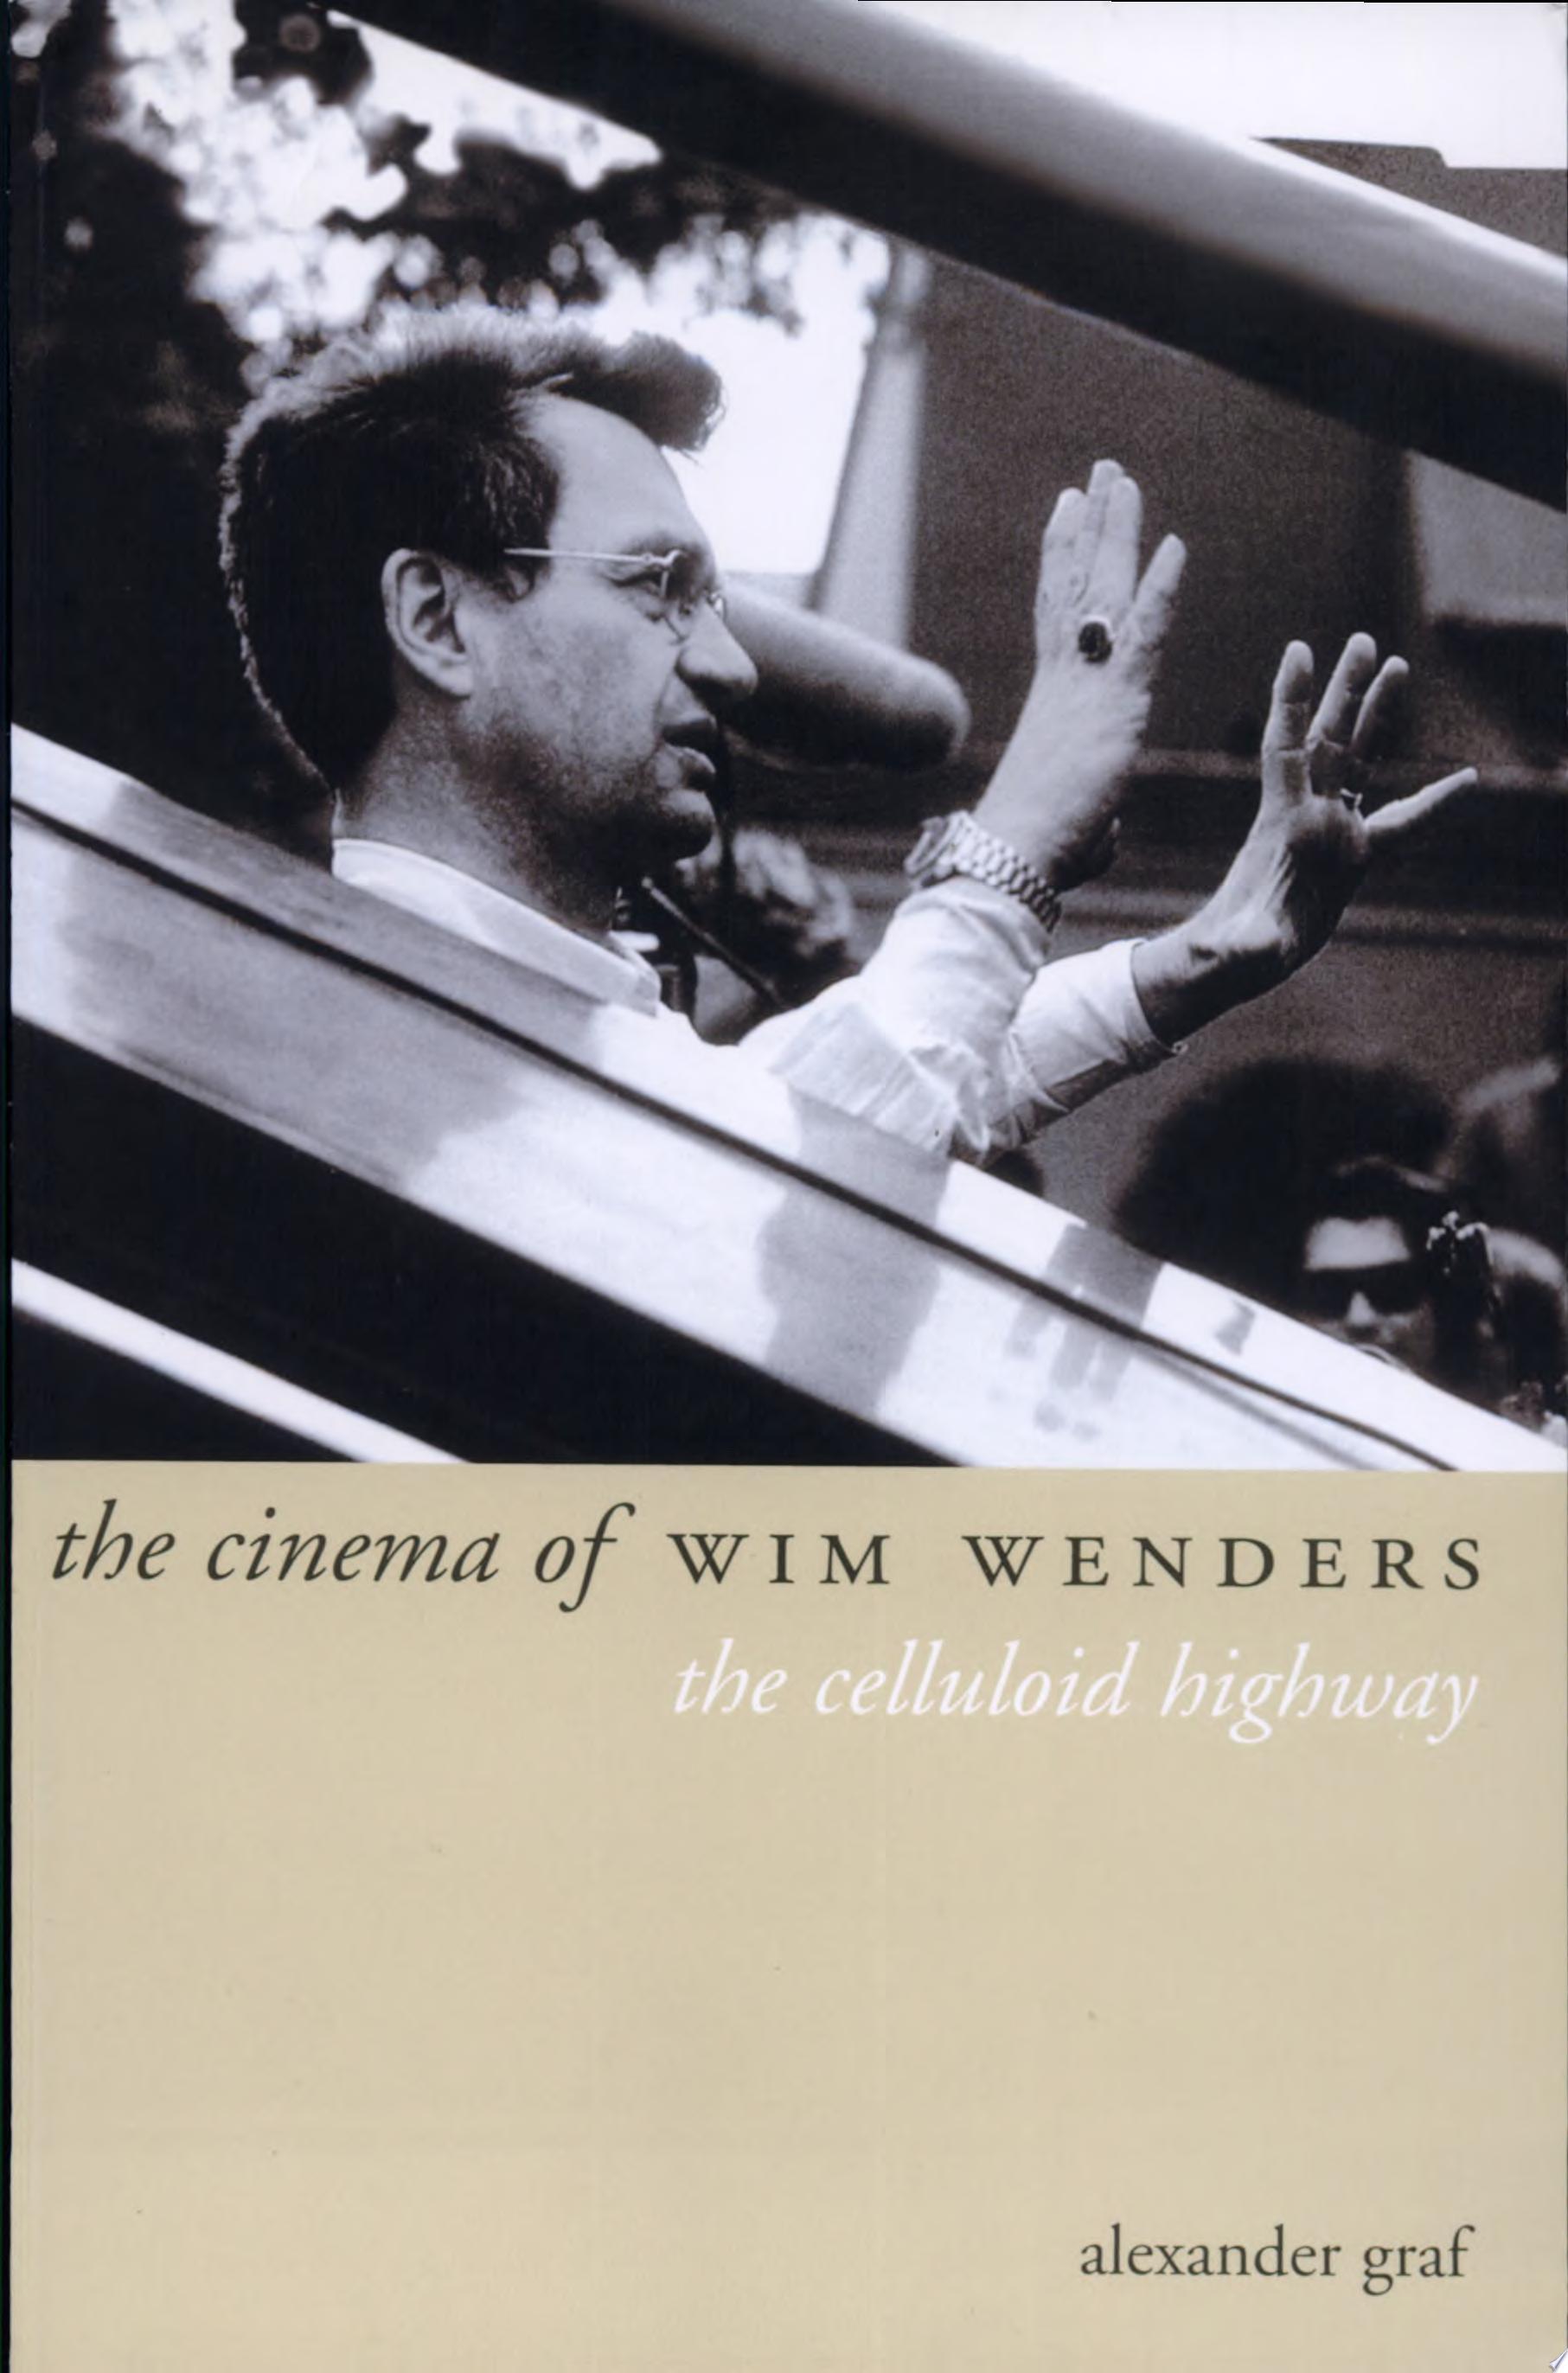 The Cinema of Wim Wenders